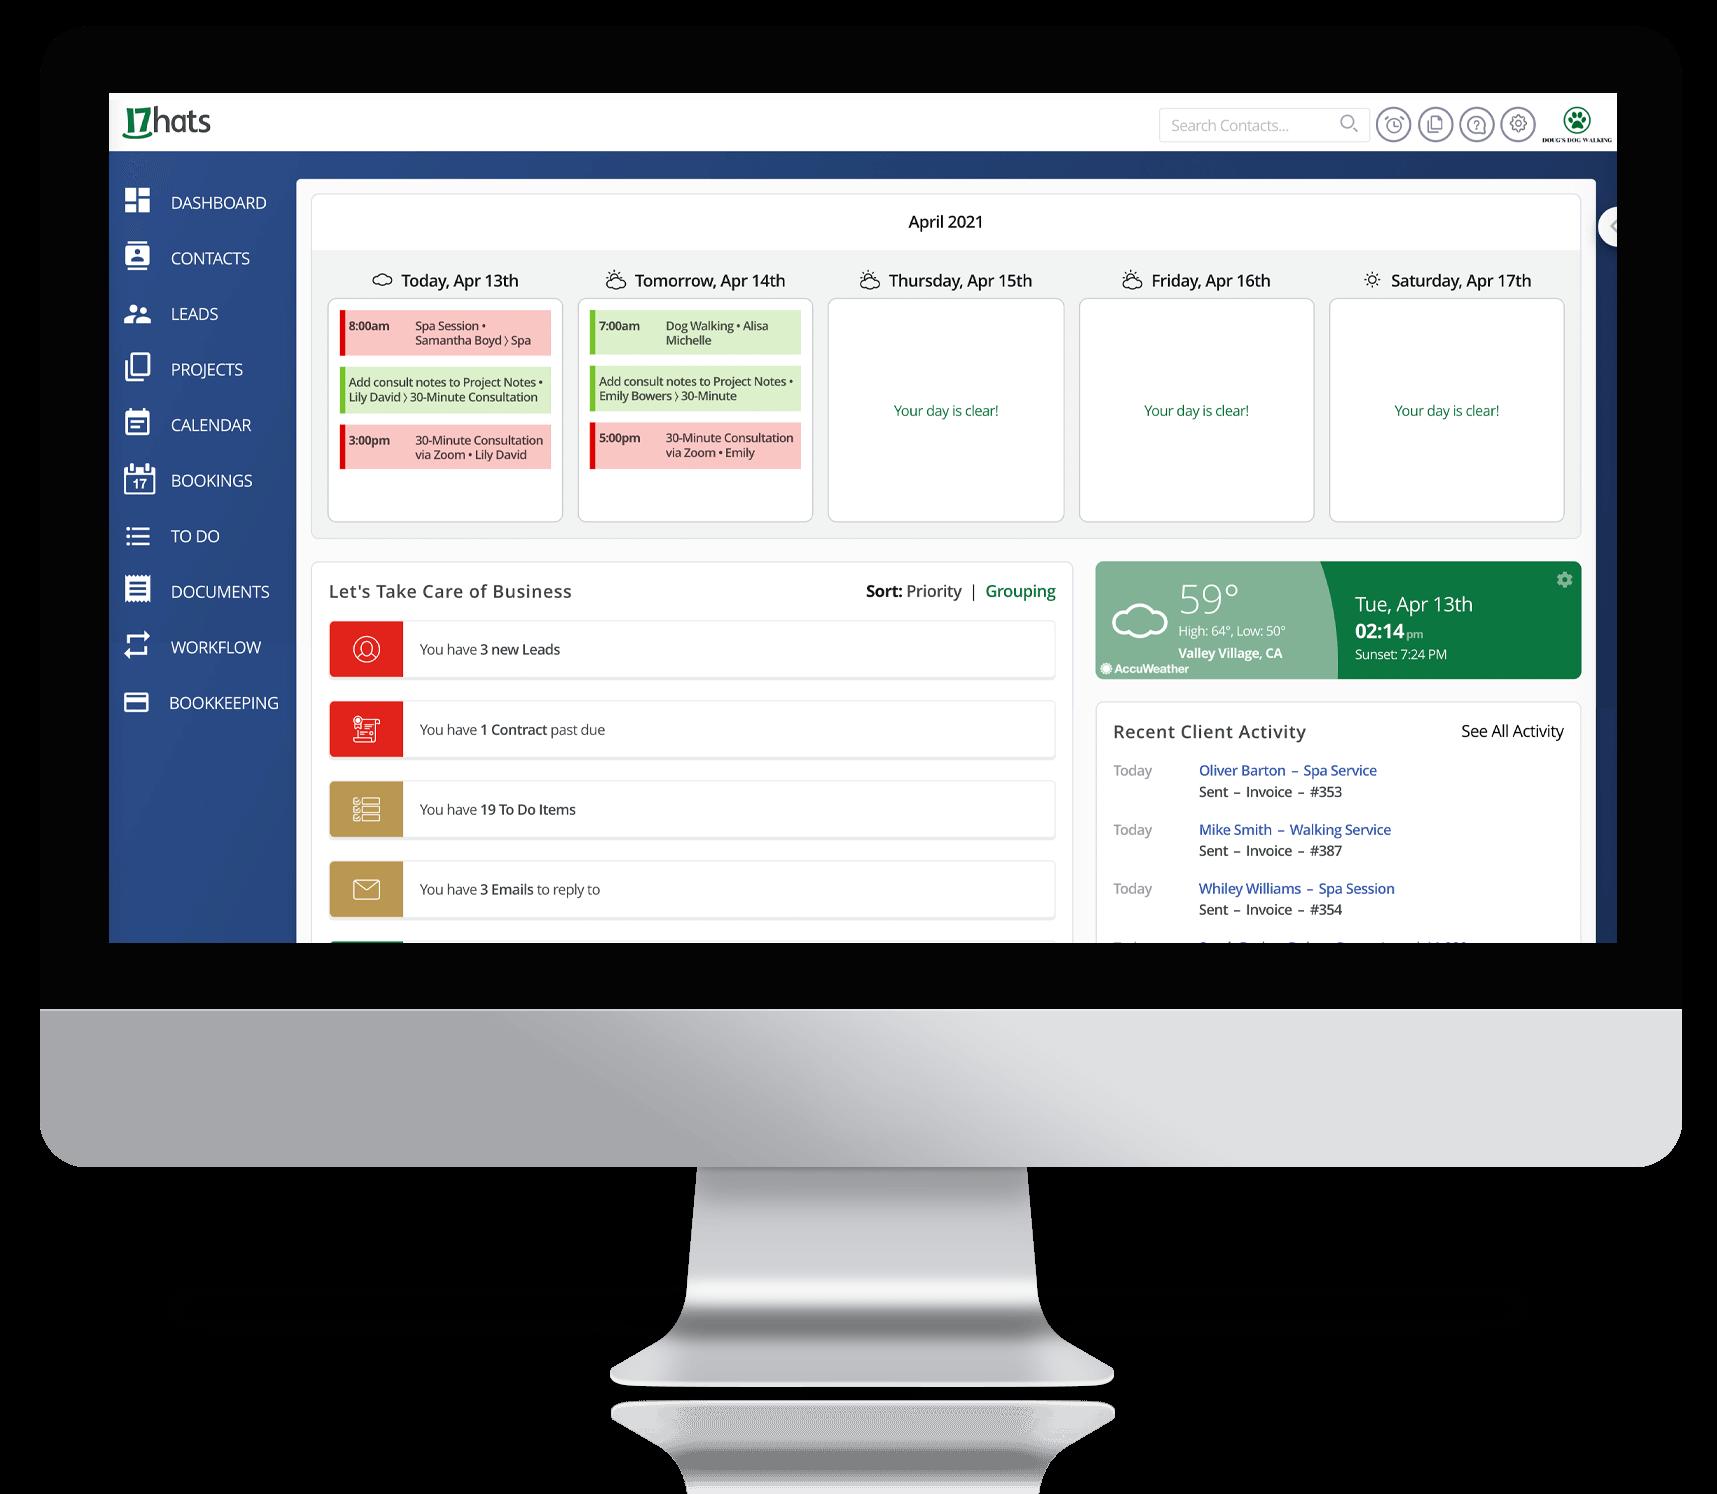 17hats Level Three Dashboard Small Business Automation Platform